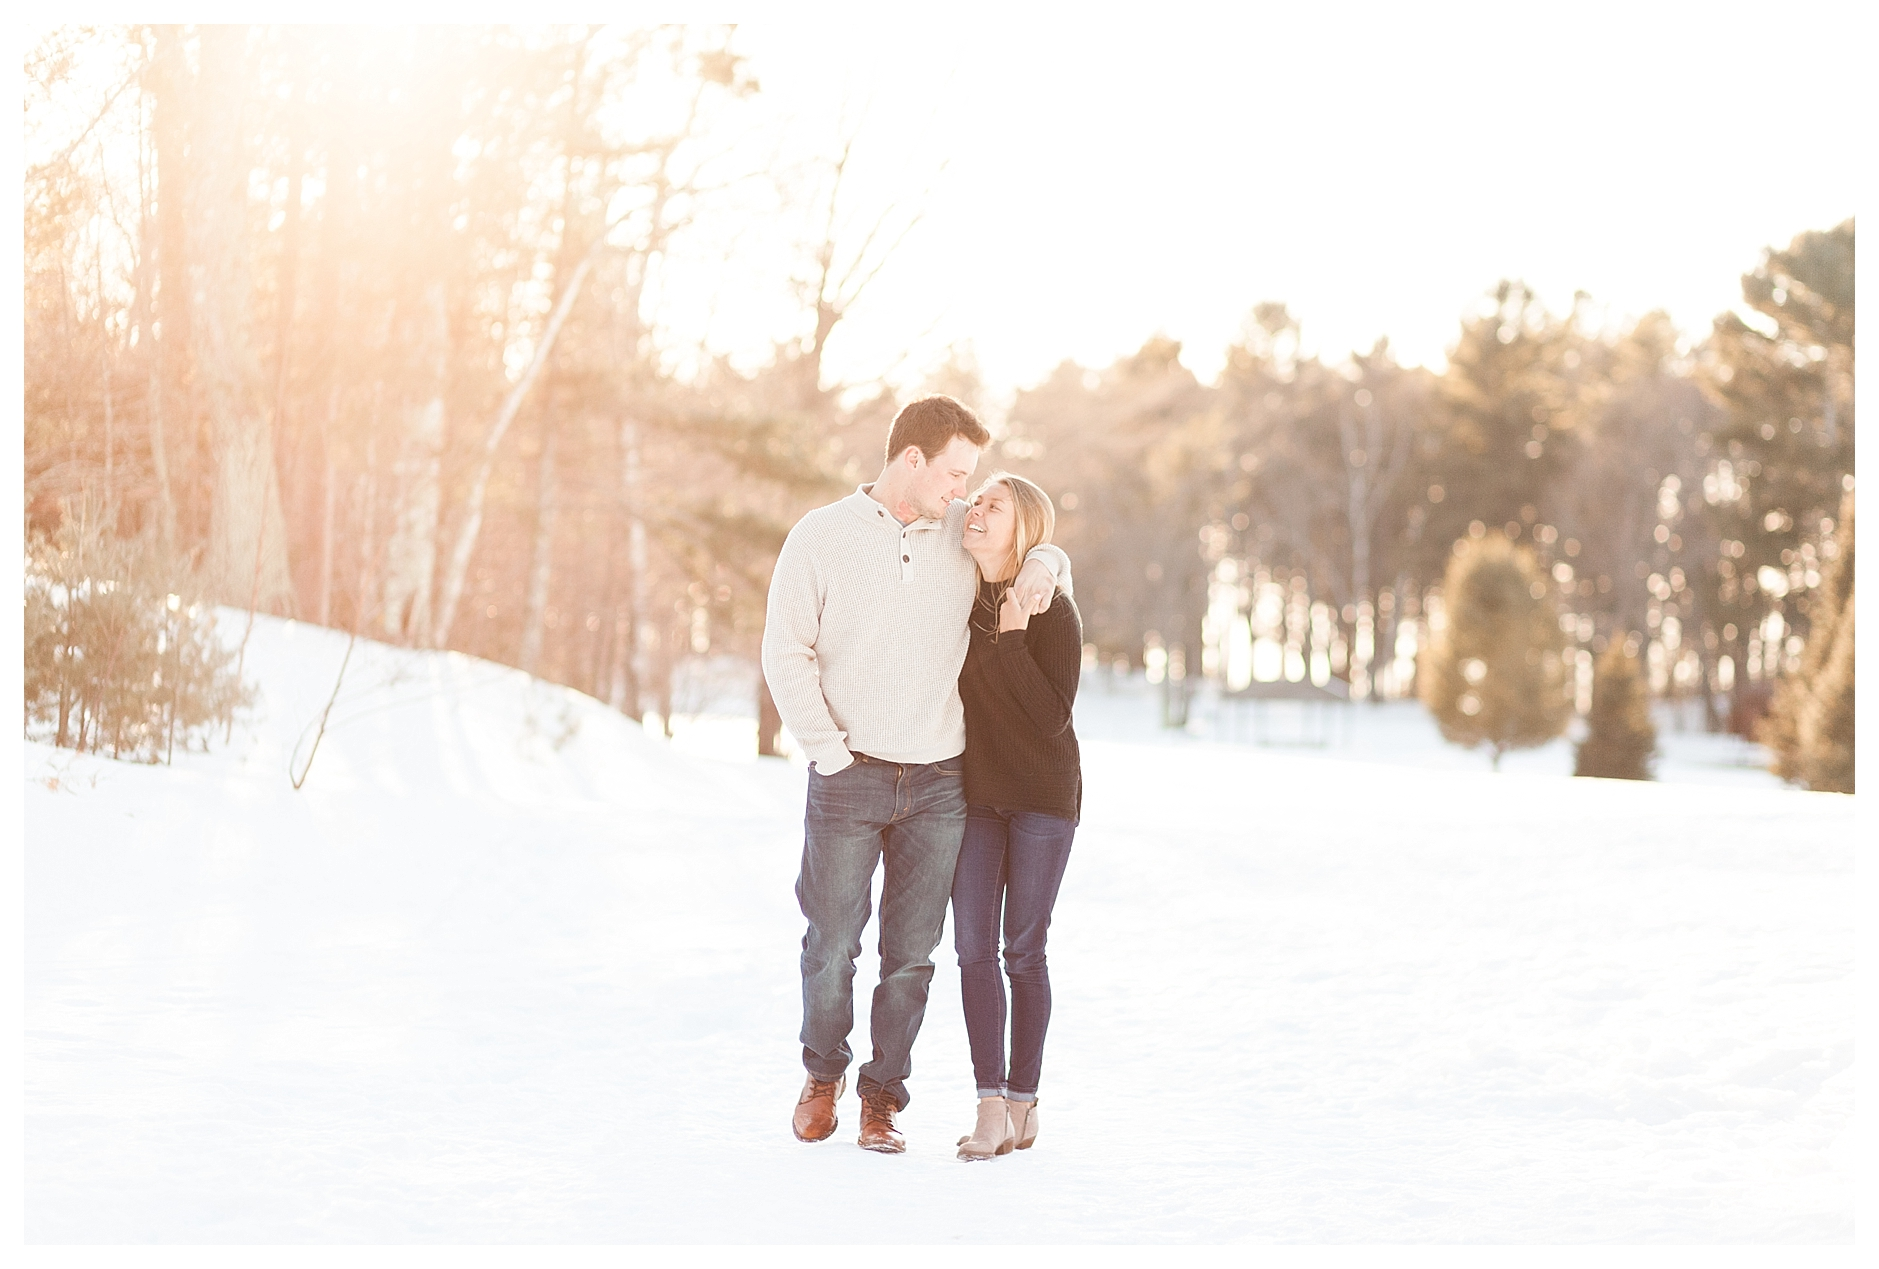 Jeff&Ashley Upper Peninsula Winter Engagement session_0058.jpg